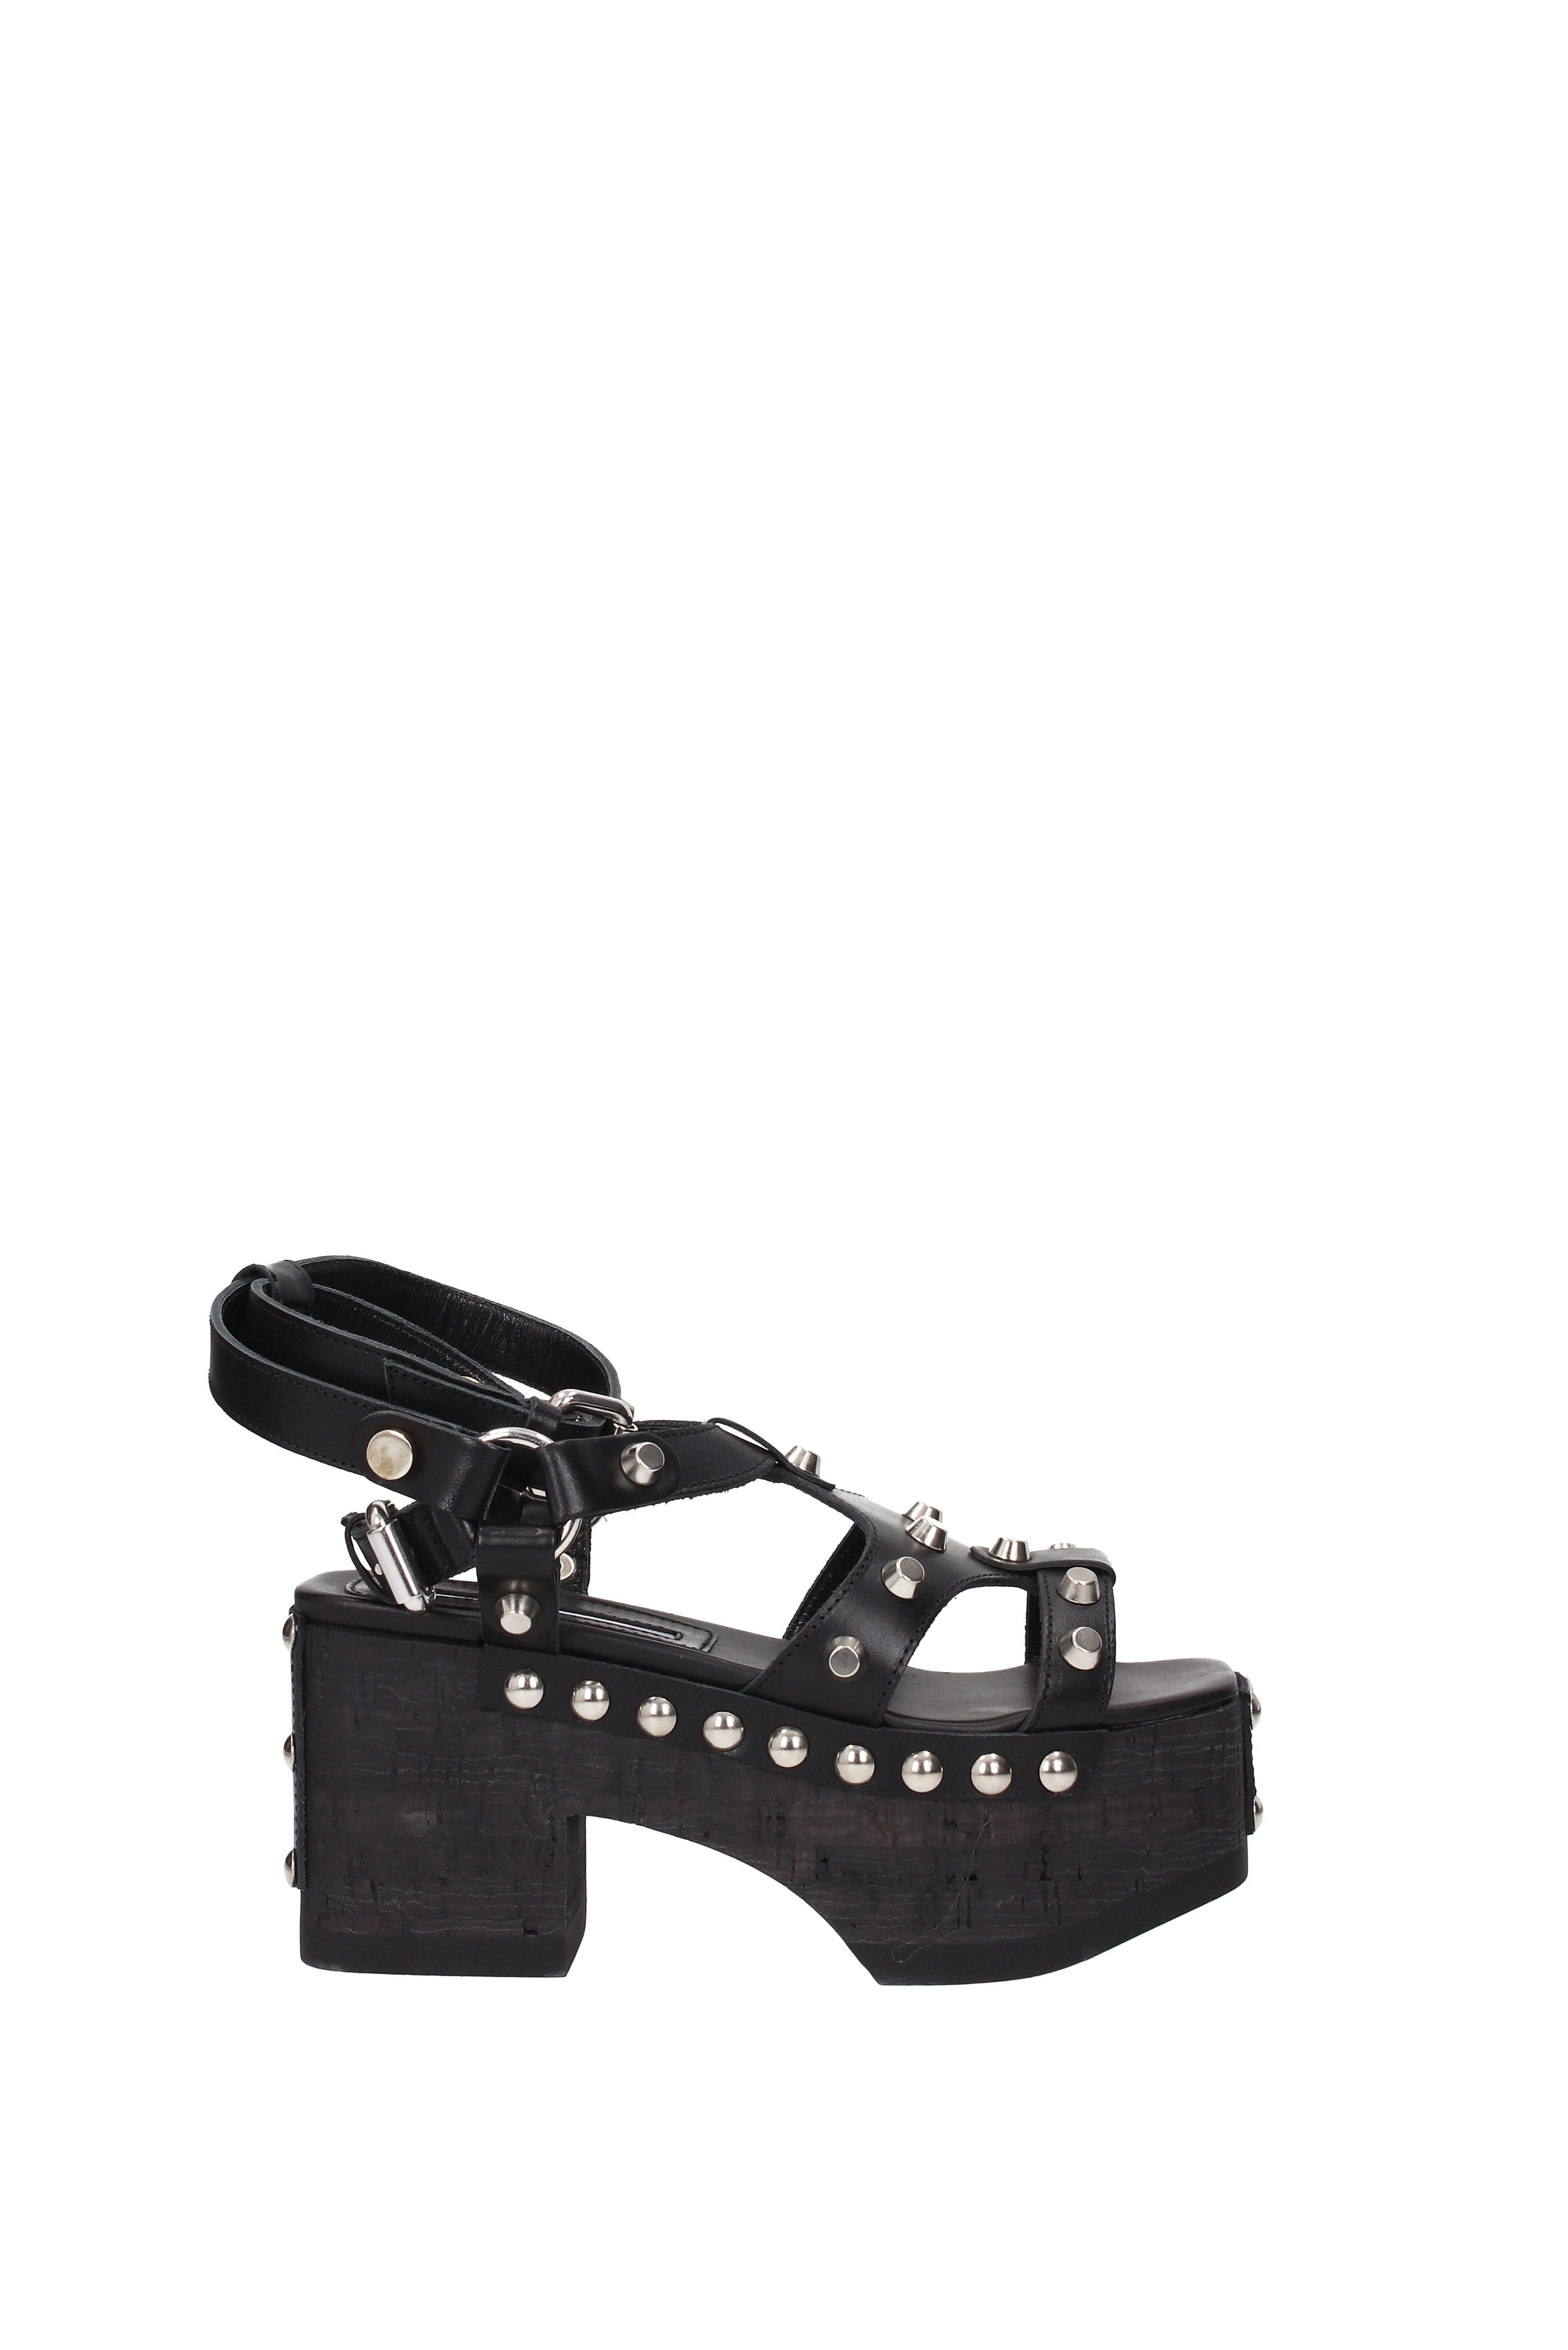 Sandals Alexander Alexander Sandals McQueen paloma gladiator Women - Leather (463337R2454) 994ada